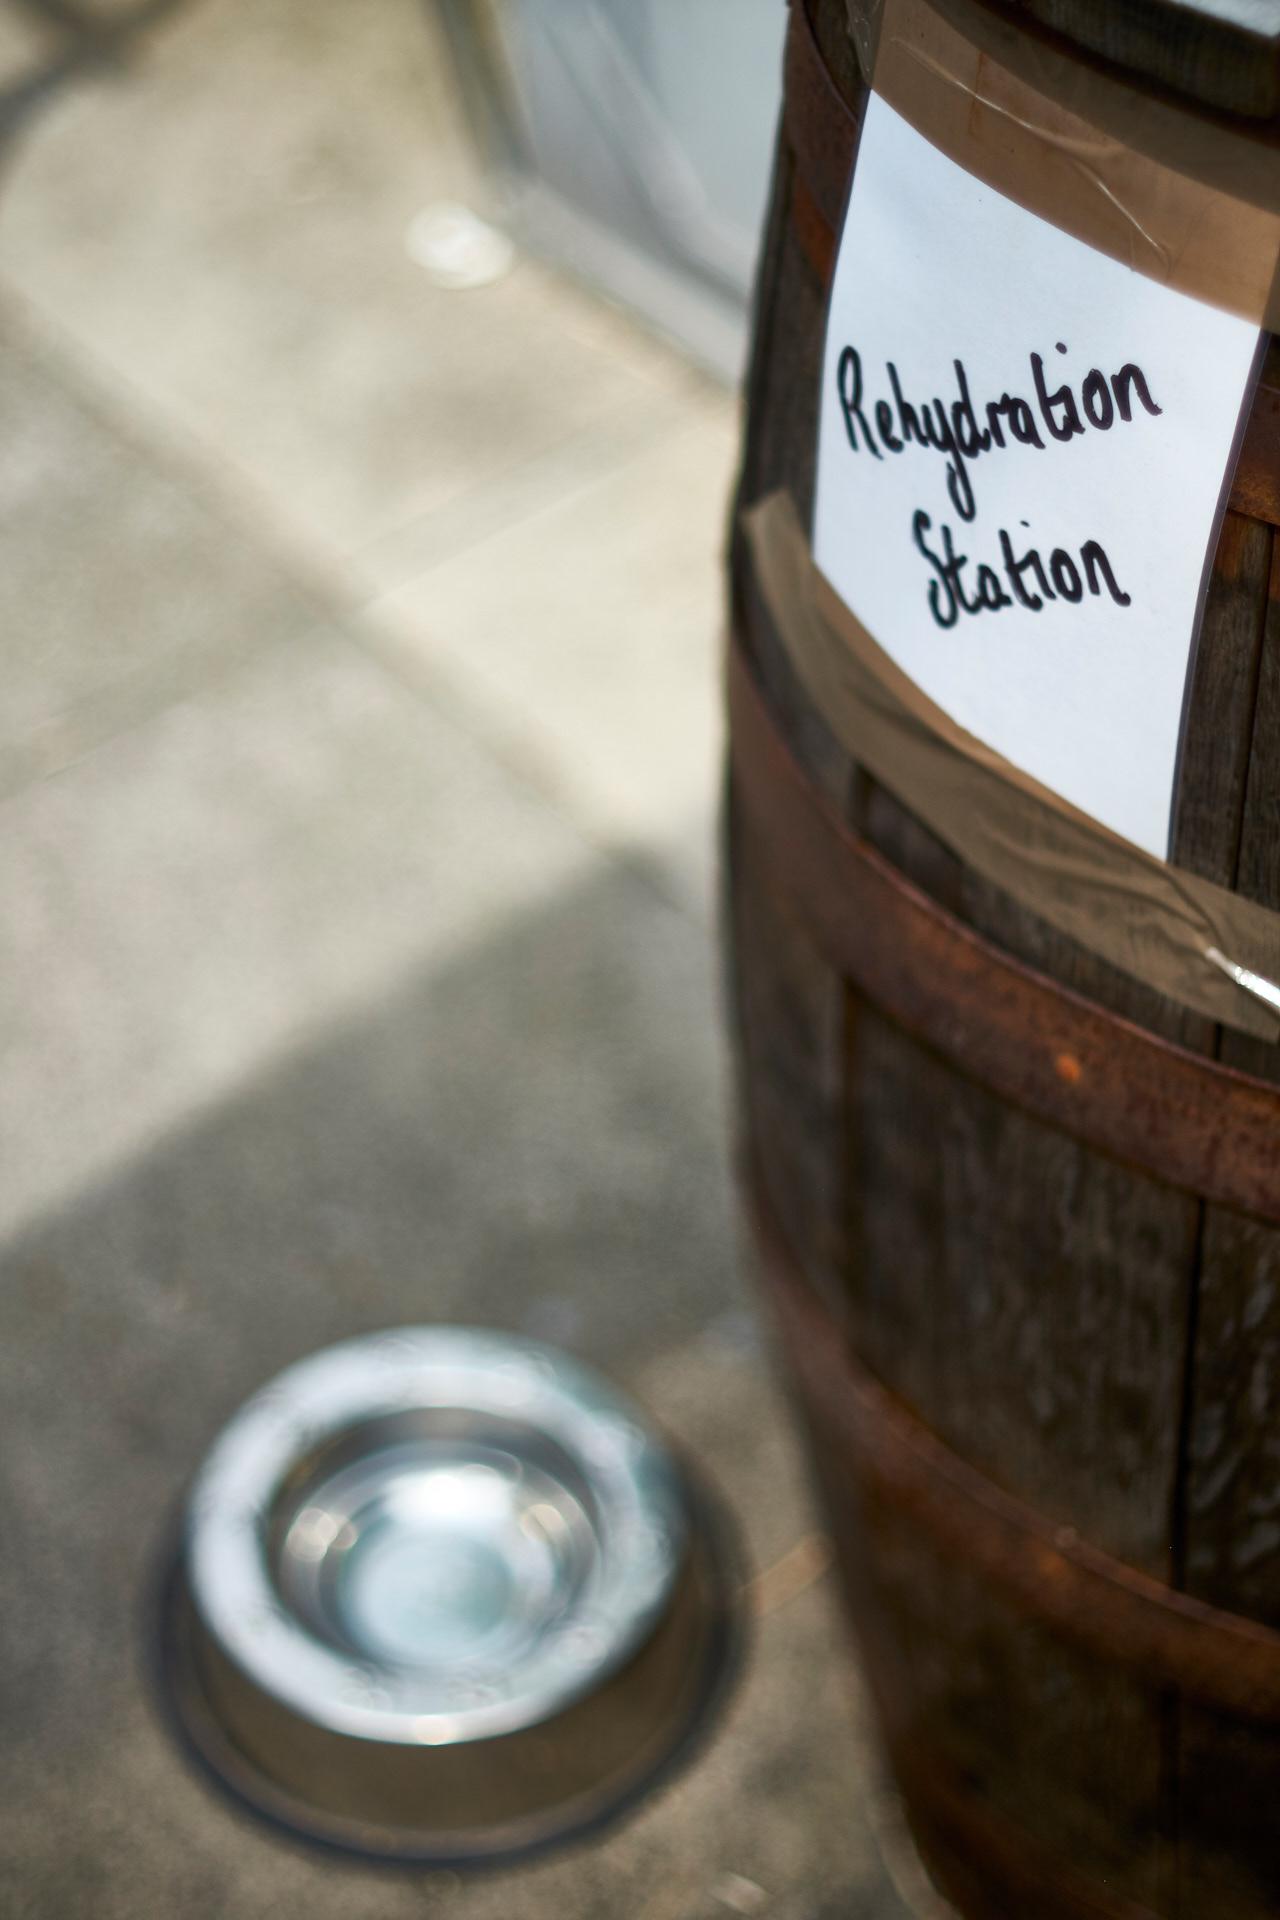 Rehydration station.